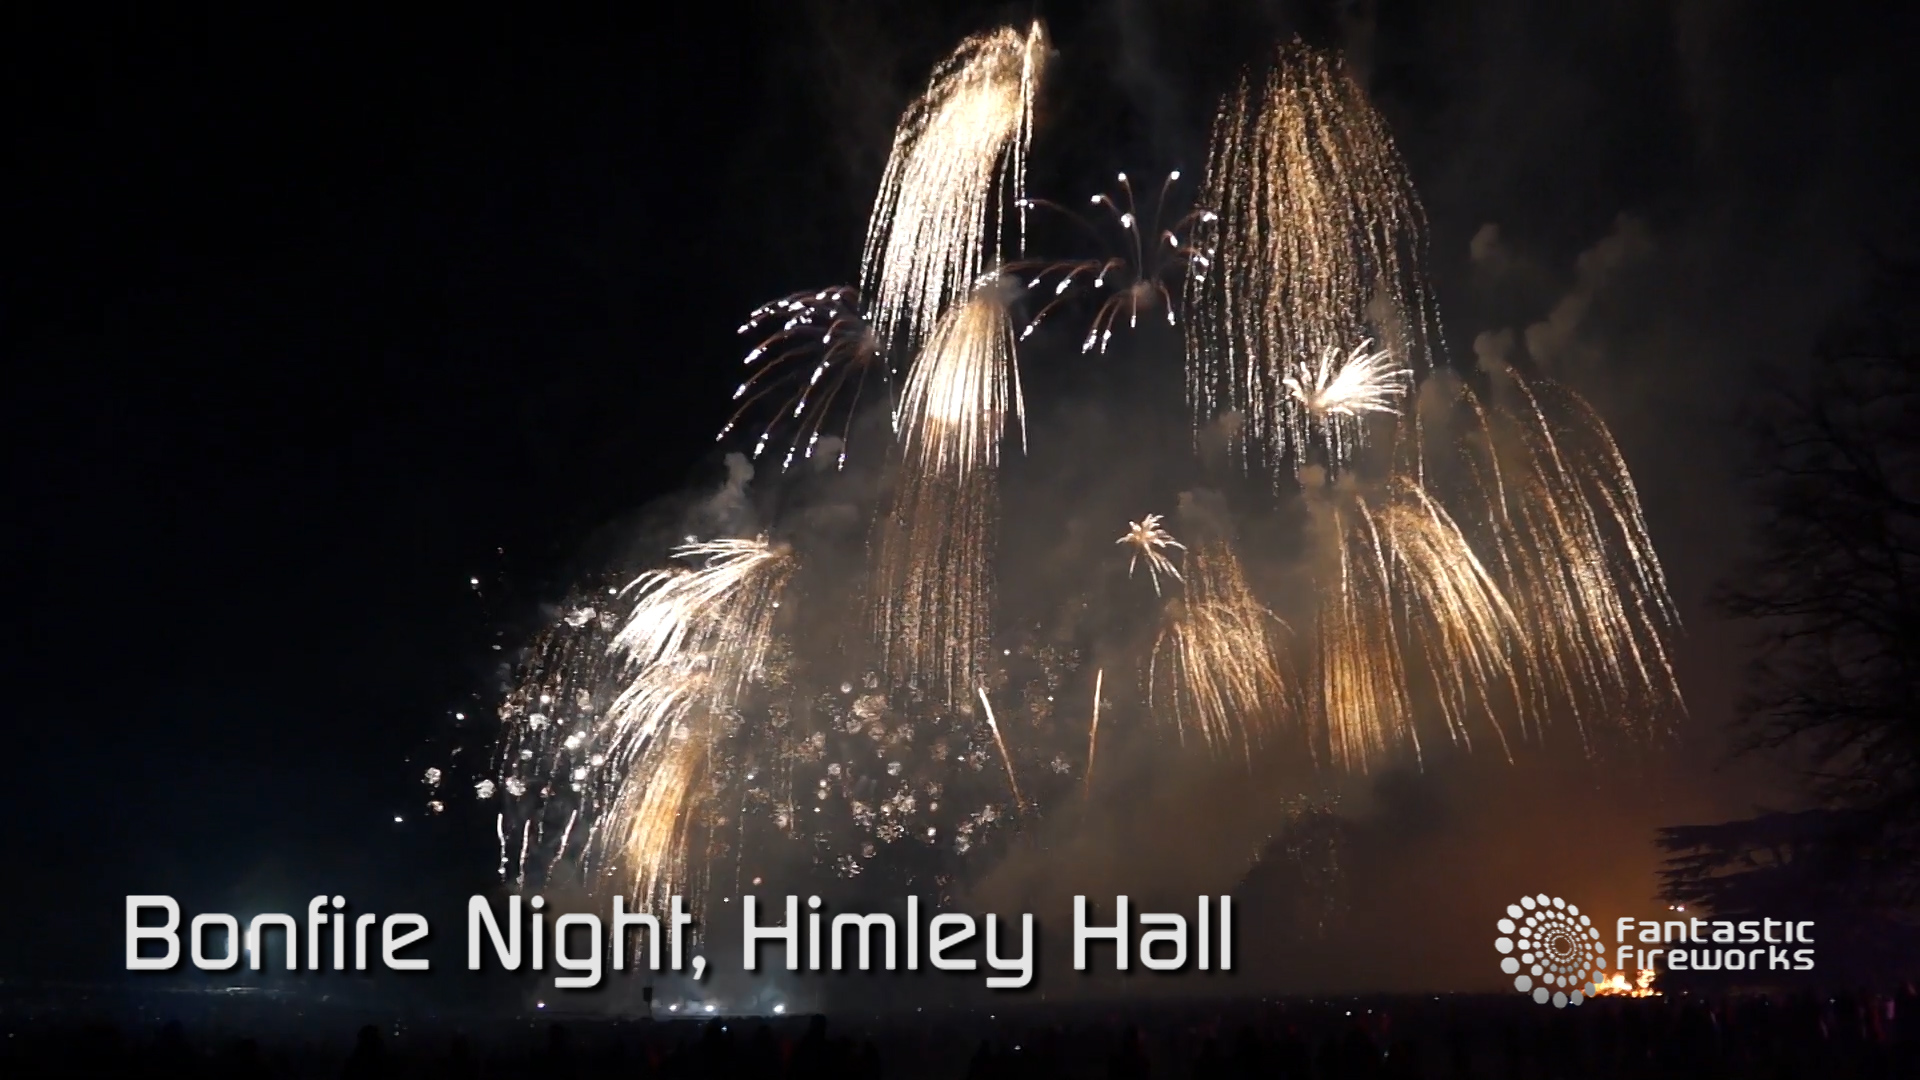 Professional Fireworks Displays | Himley Hall Bonfire Night